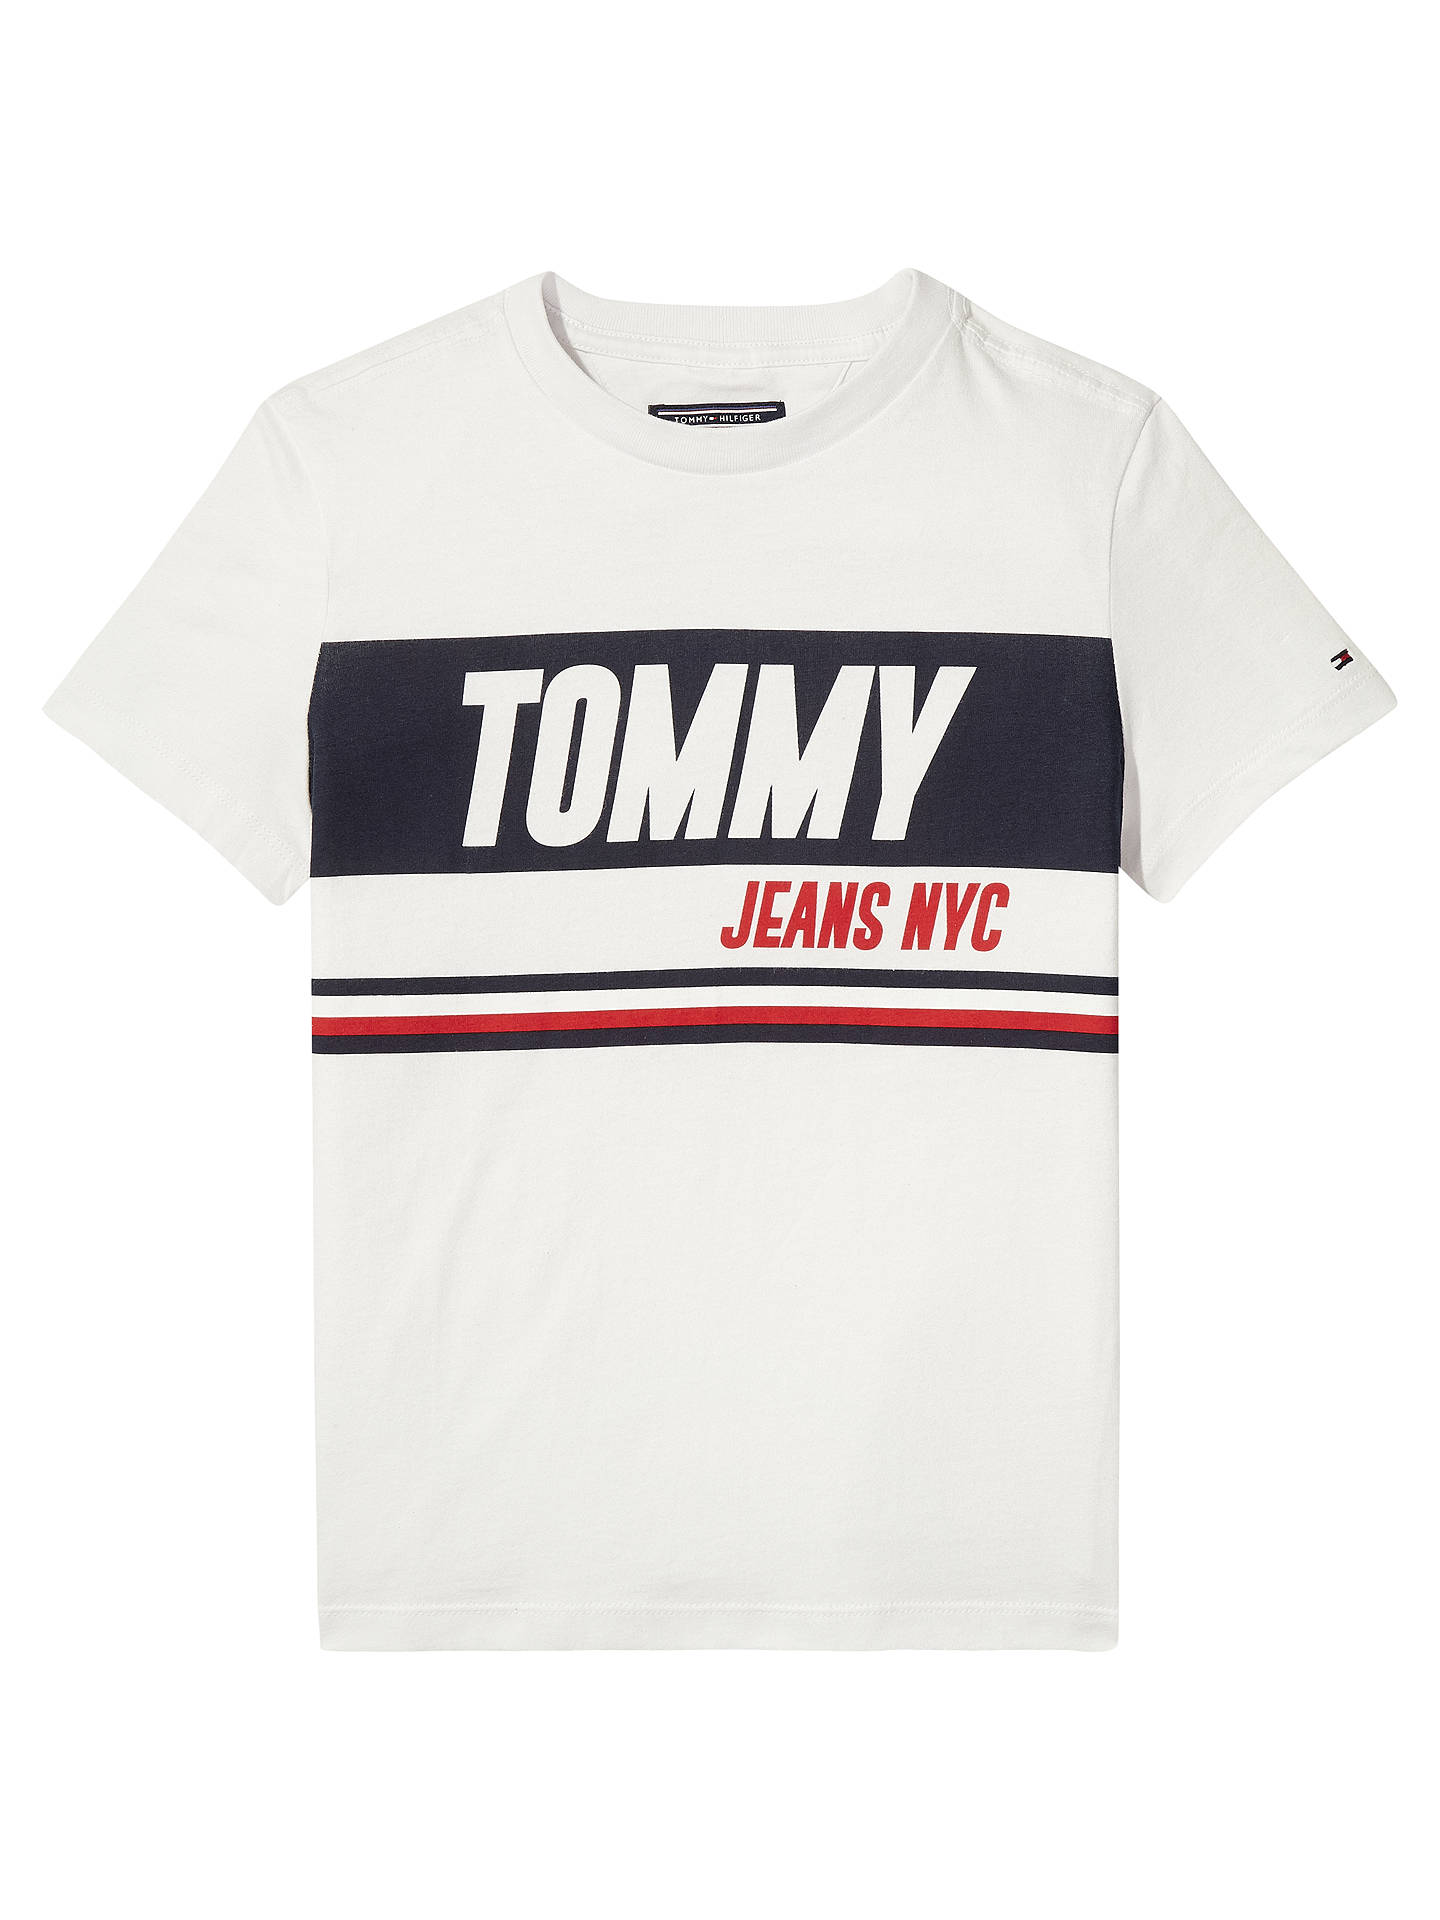 928d7061 Tommy Hilfiger Boys' Sport Print Logo T-Shirt, White at John Lewis ...